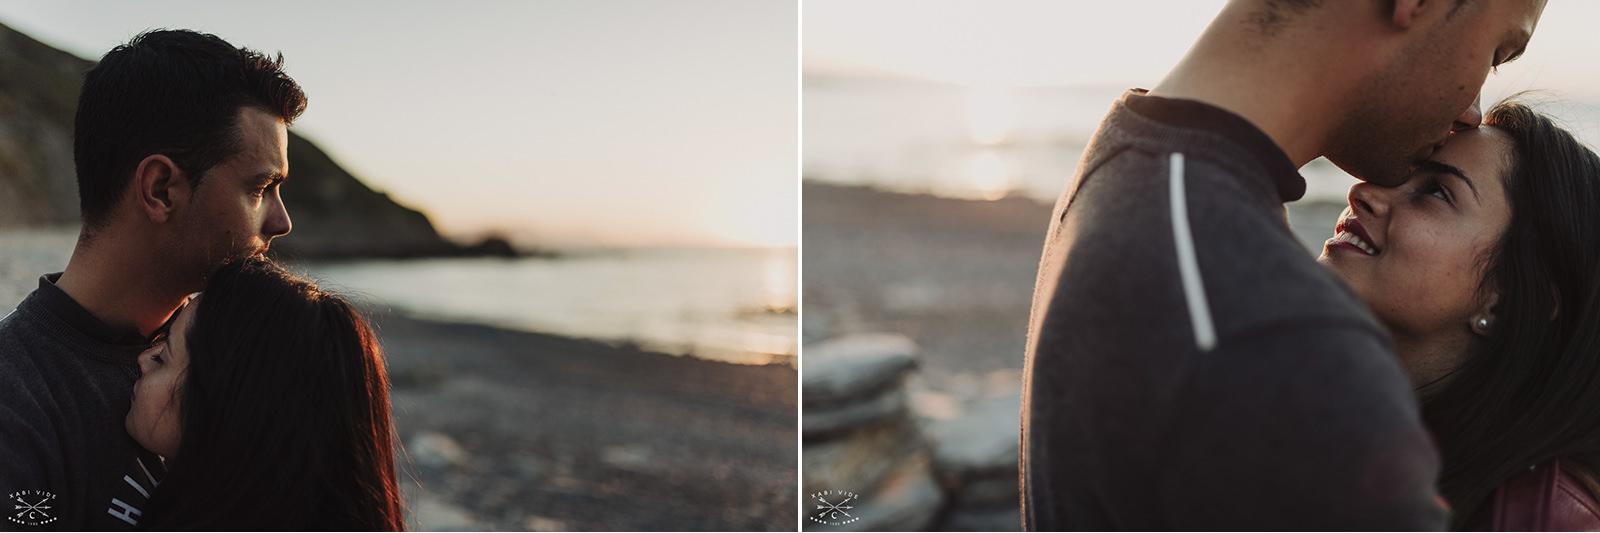 fotógrafo de bodas en bilbao-42